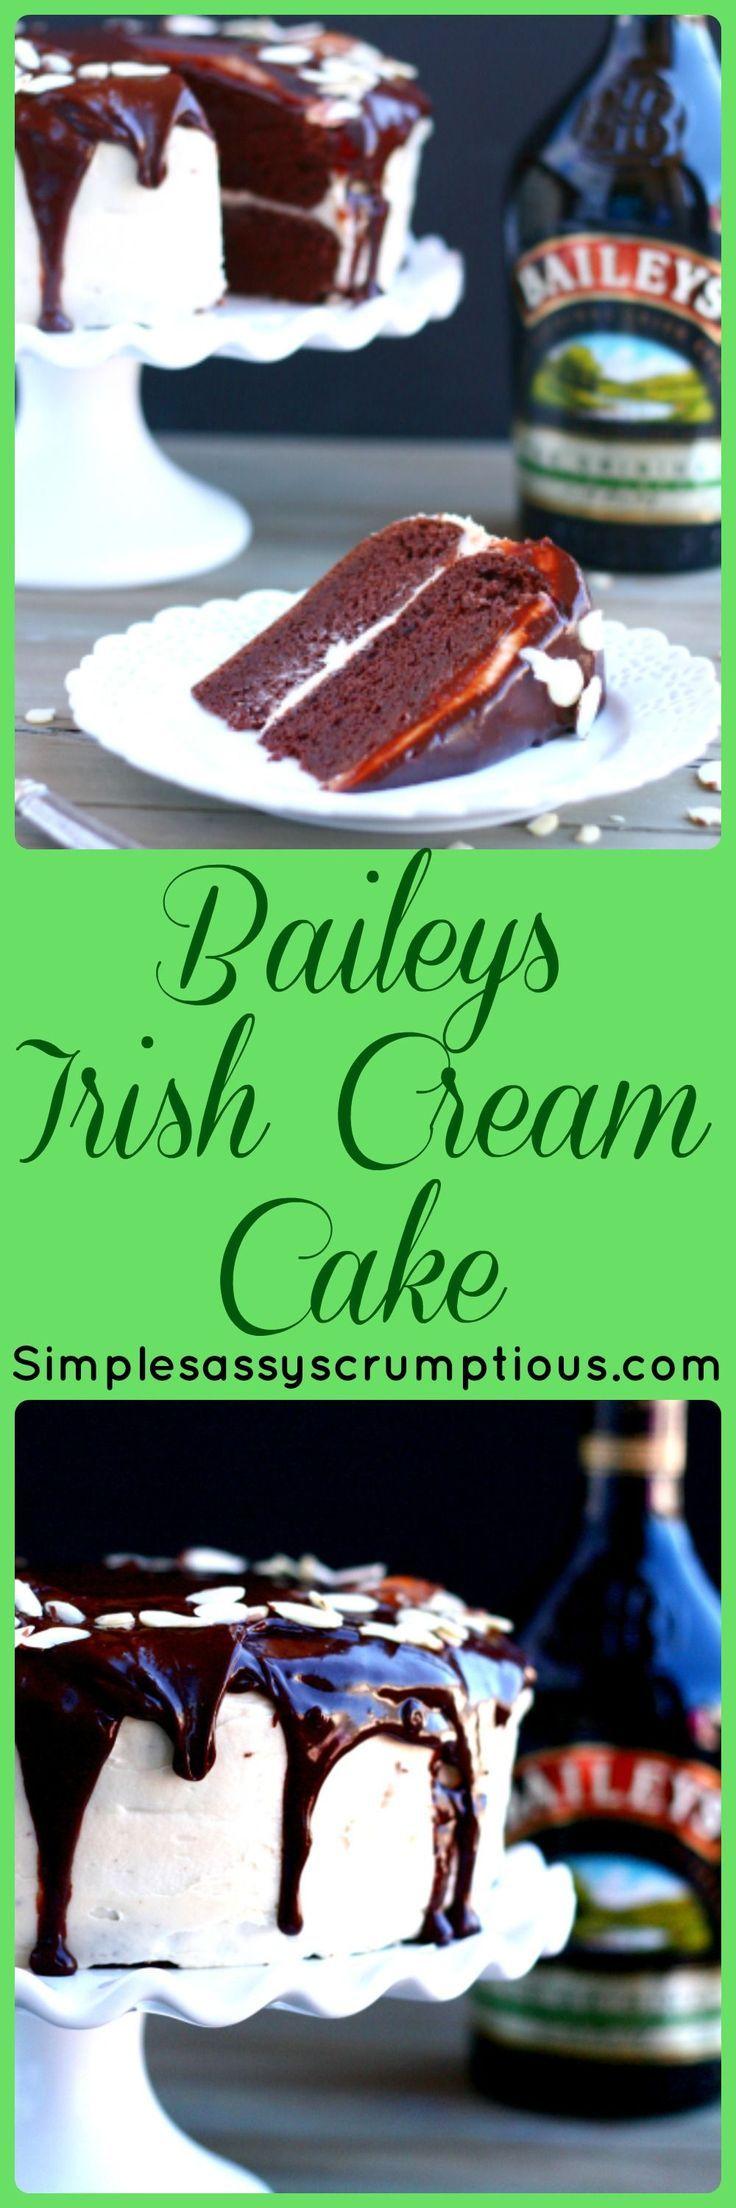 Rich chocolate cake with a hint of Baileys.  Baileys Irish Cream Cake!